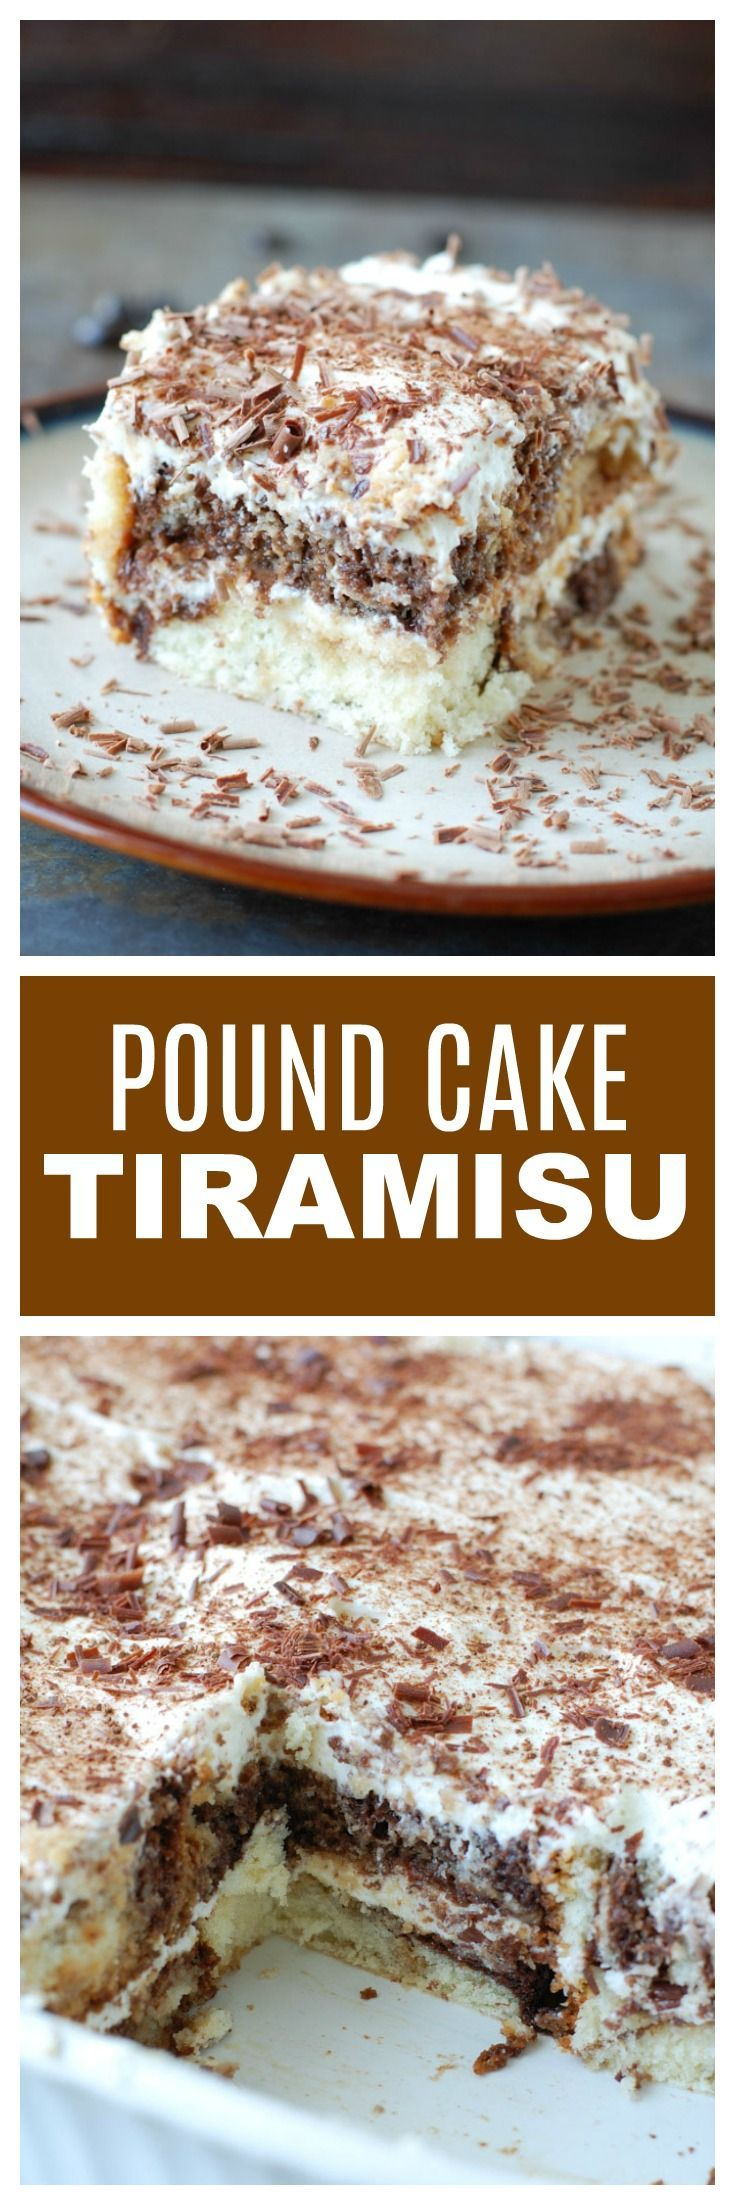 Easy Pound Cake Tiramisu: | Posted By: DebbieNet.com